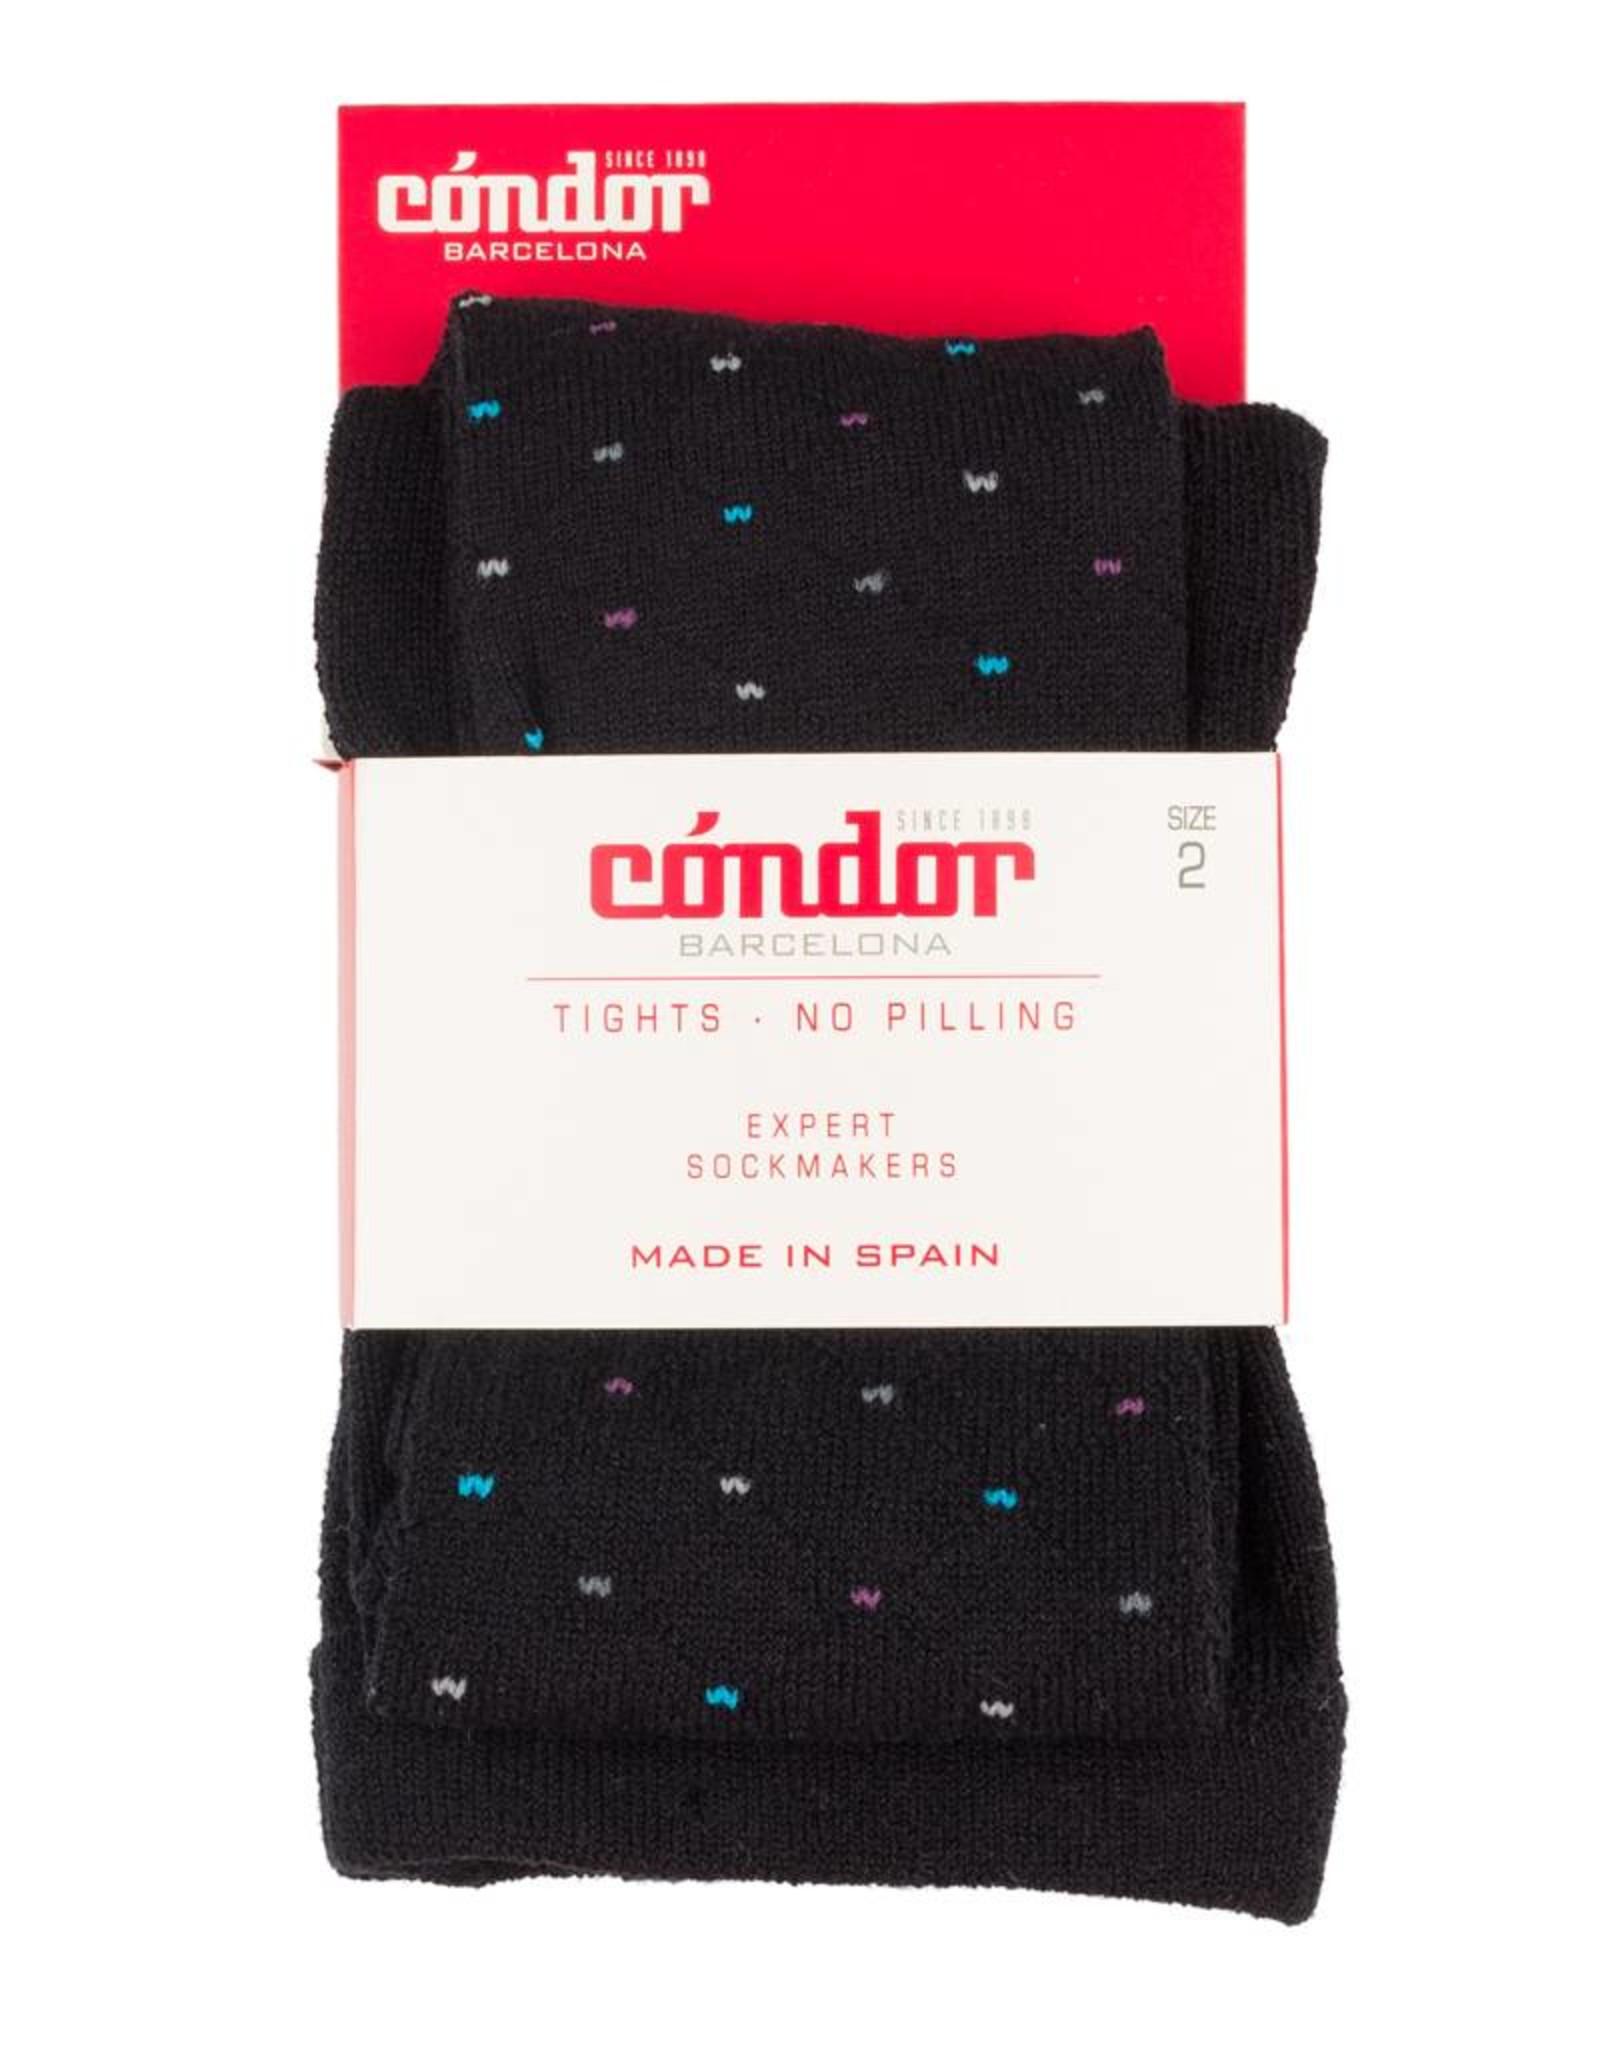 Condor Condor Diamond Shape Polka Dot Print Tights